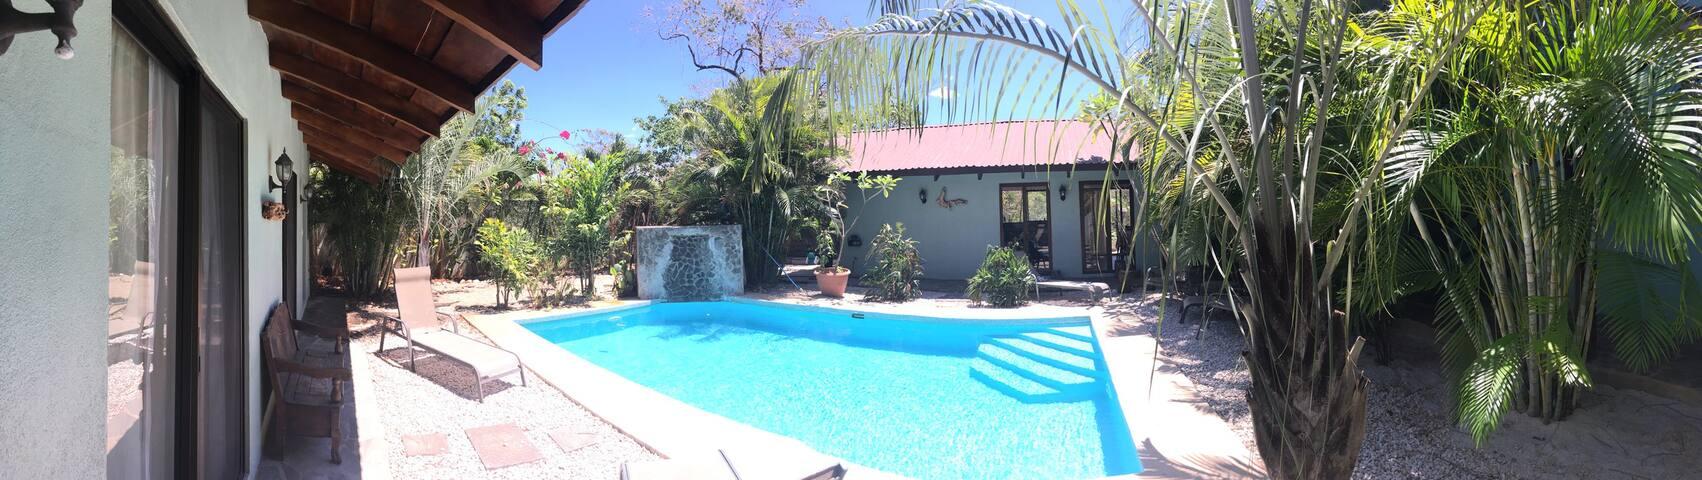 StoneHouse Playa Negra -Junquillal/Playa Negra